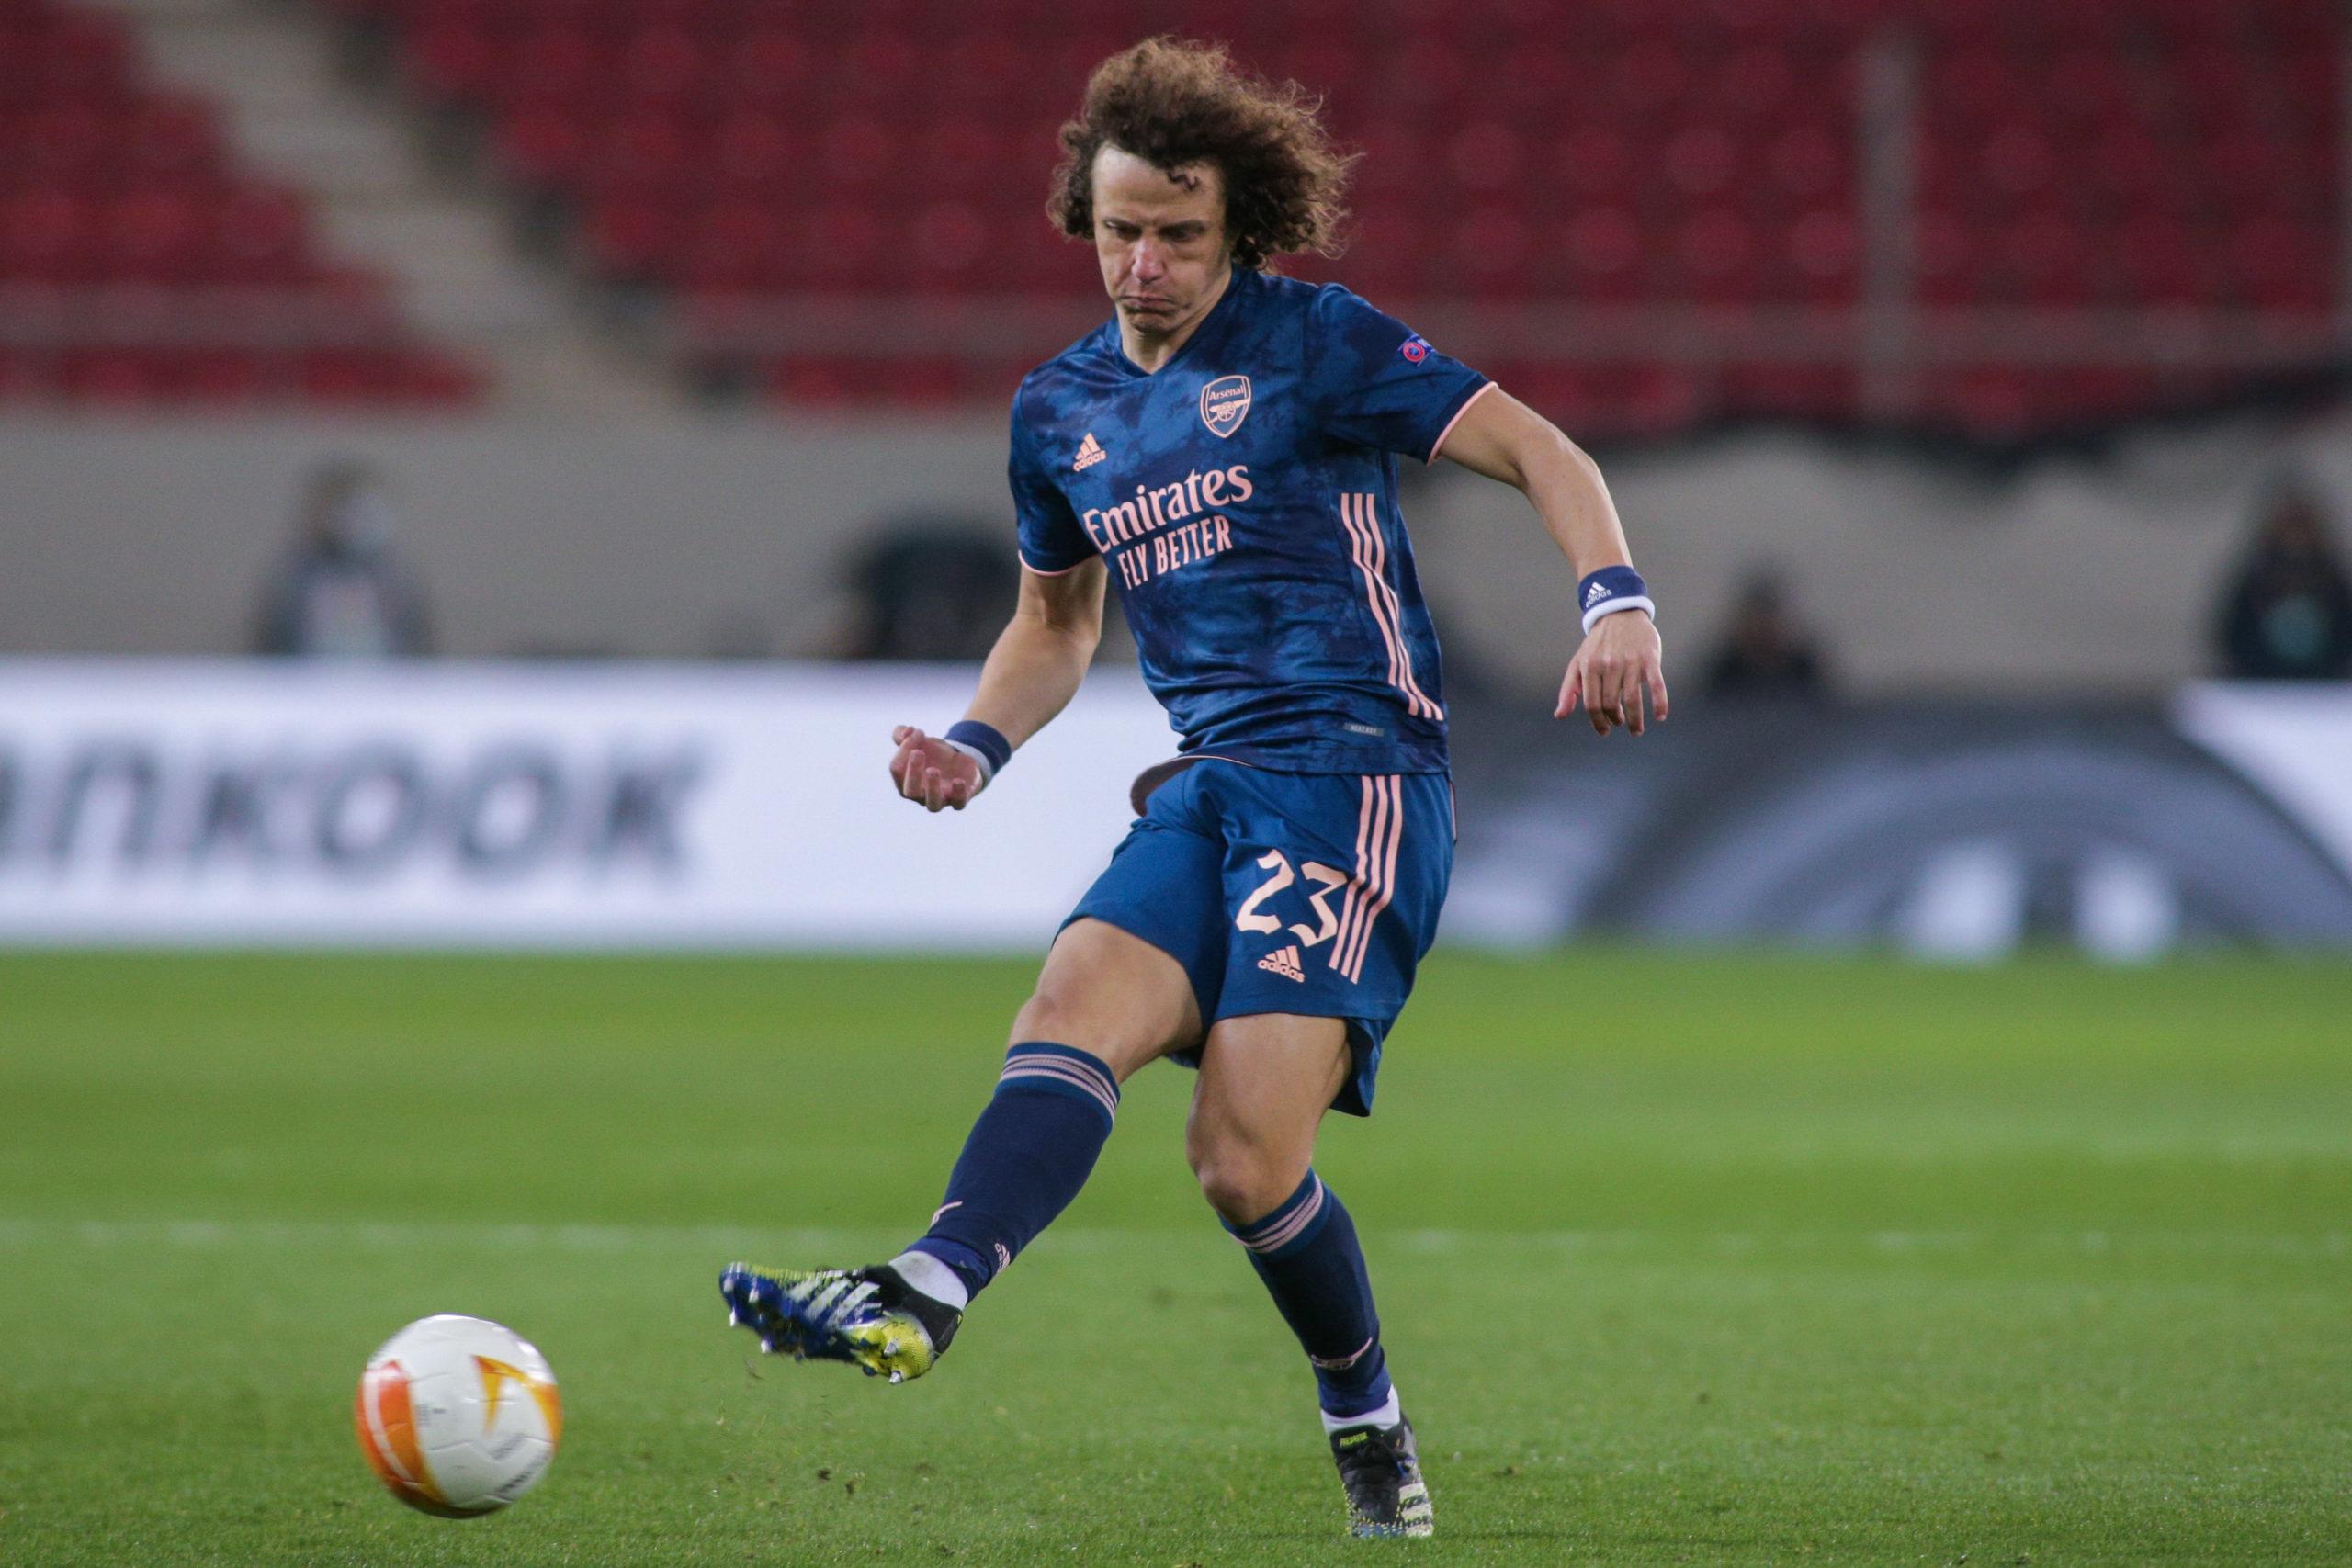 Mercato OM : La concurrence s'intensifie pour David Luiz